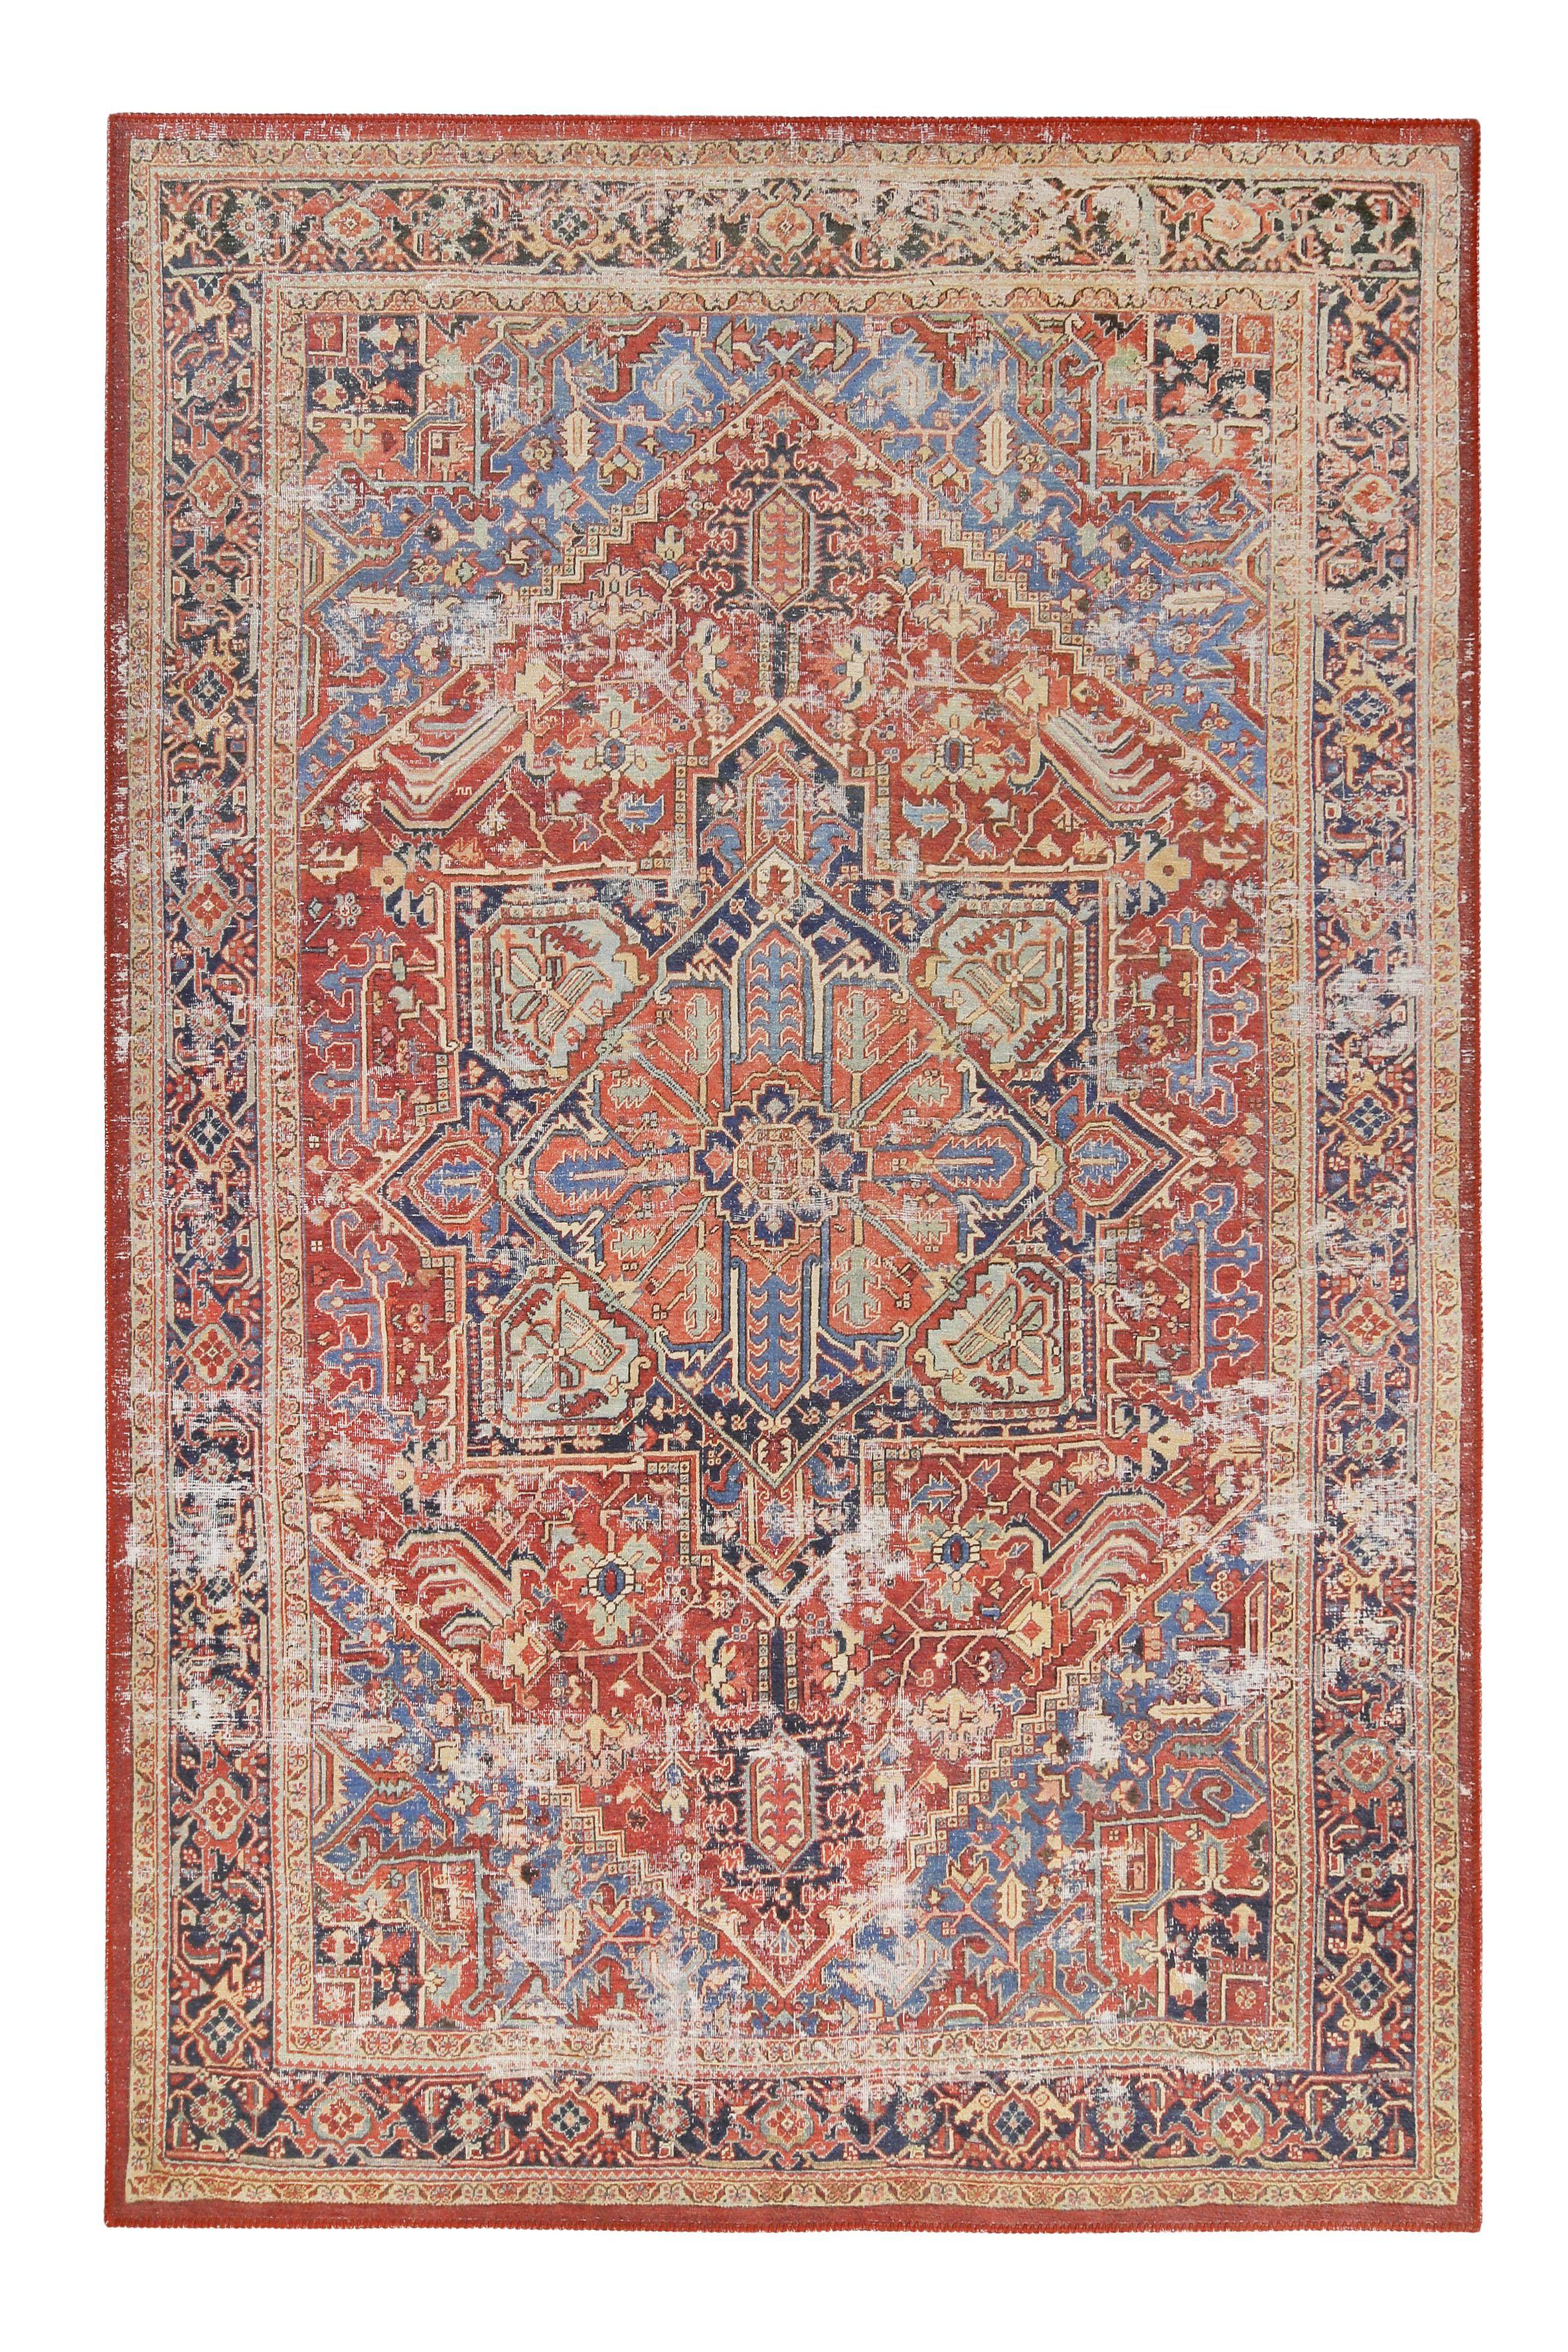 Vintage Orient Teppich Rot Blau Como Homie Living Vintage Teppiche Teppich Teppich Beige